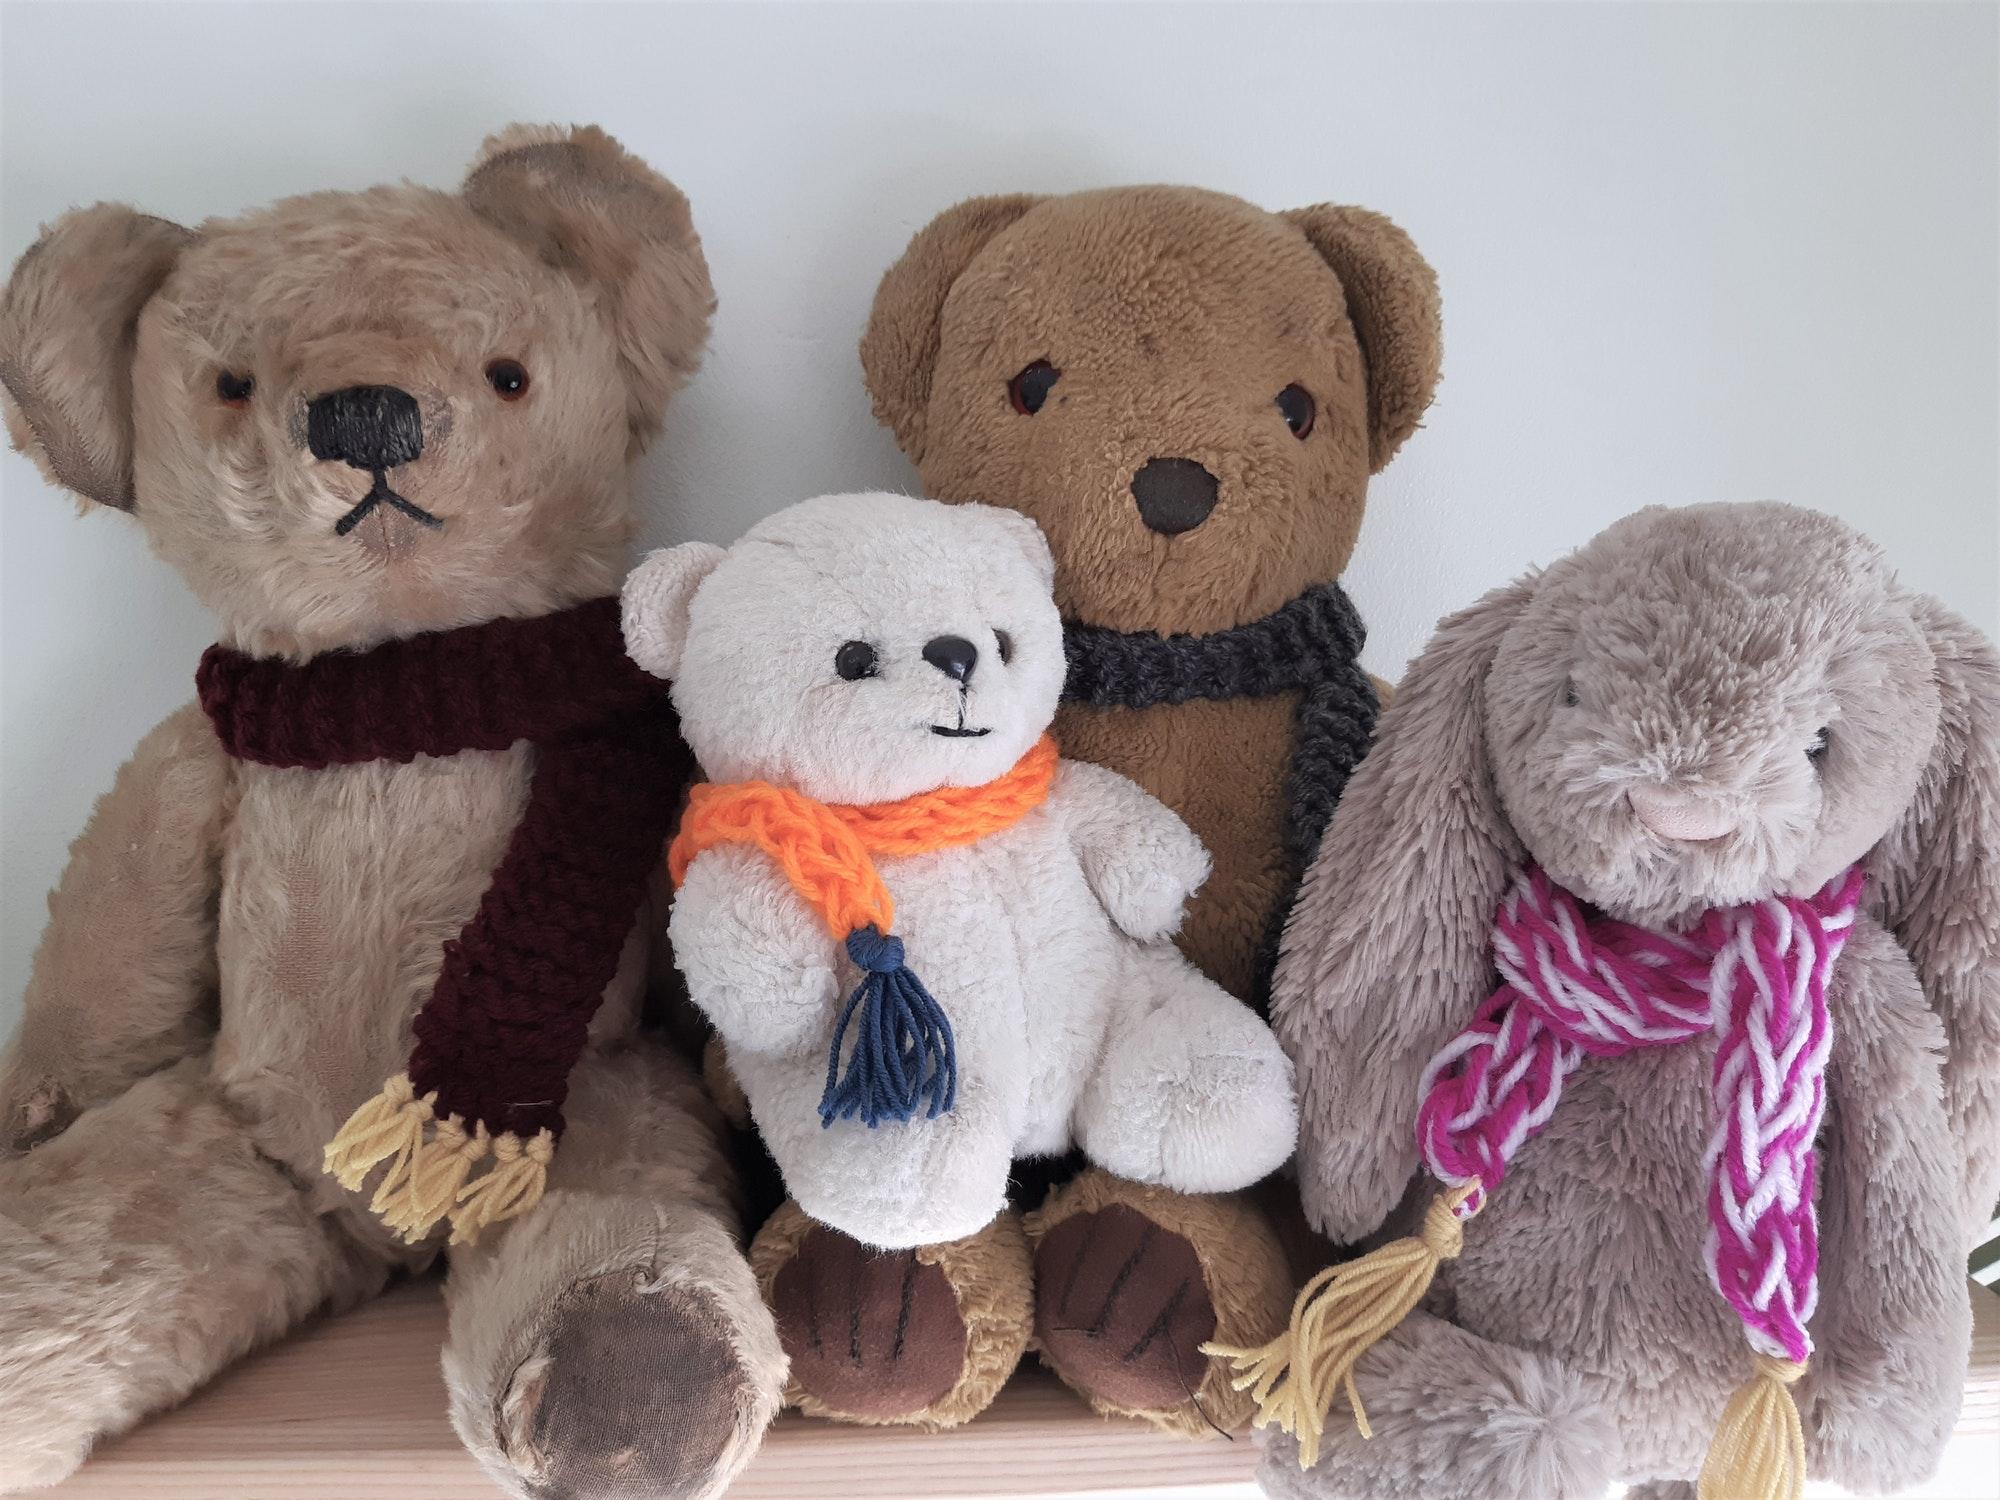 Crafty Tuesday: Teddy Bear Scarves - Derby Days Out